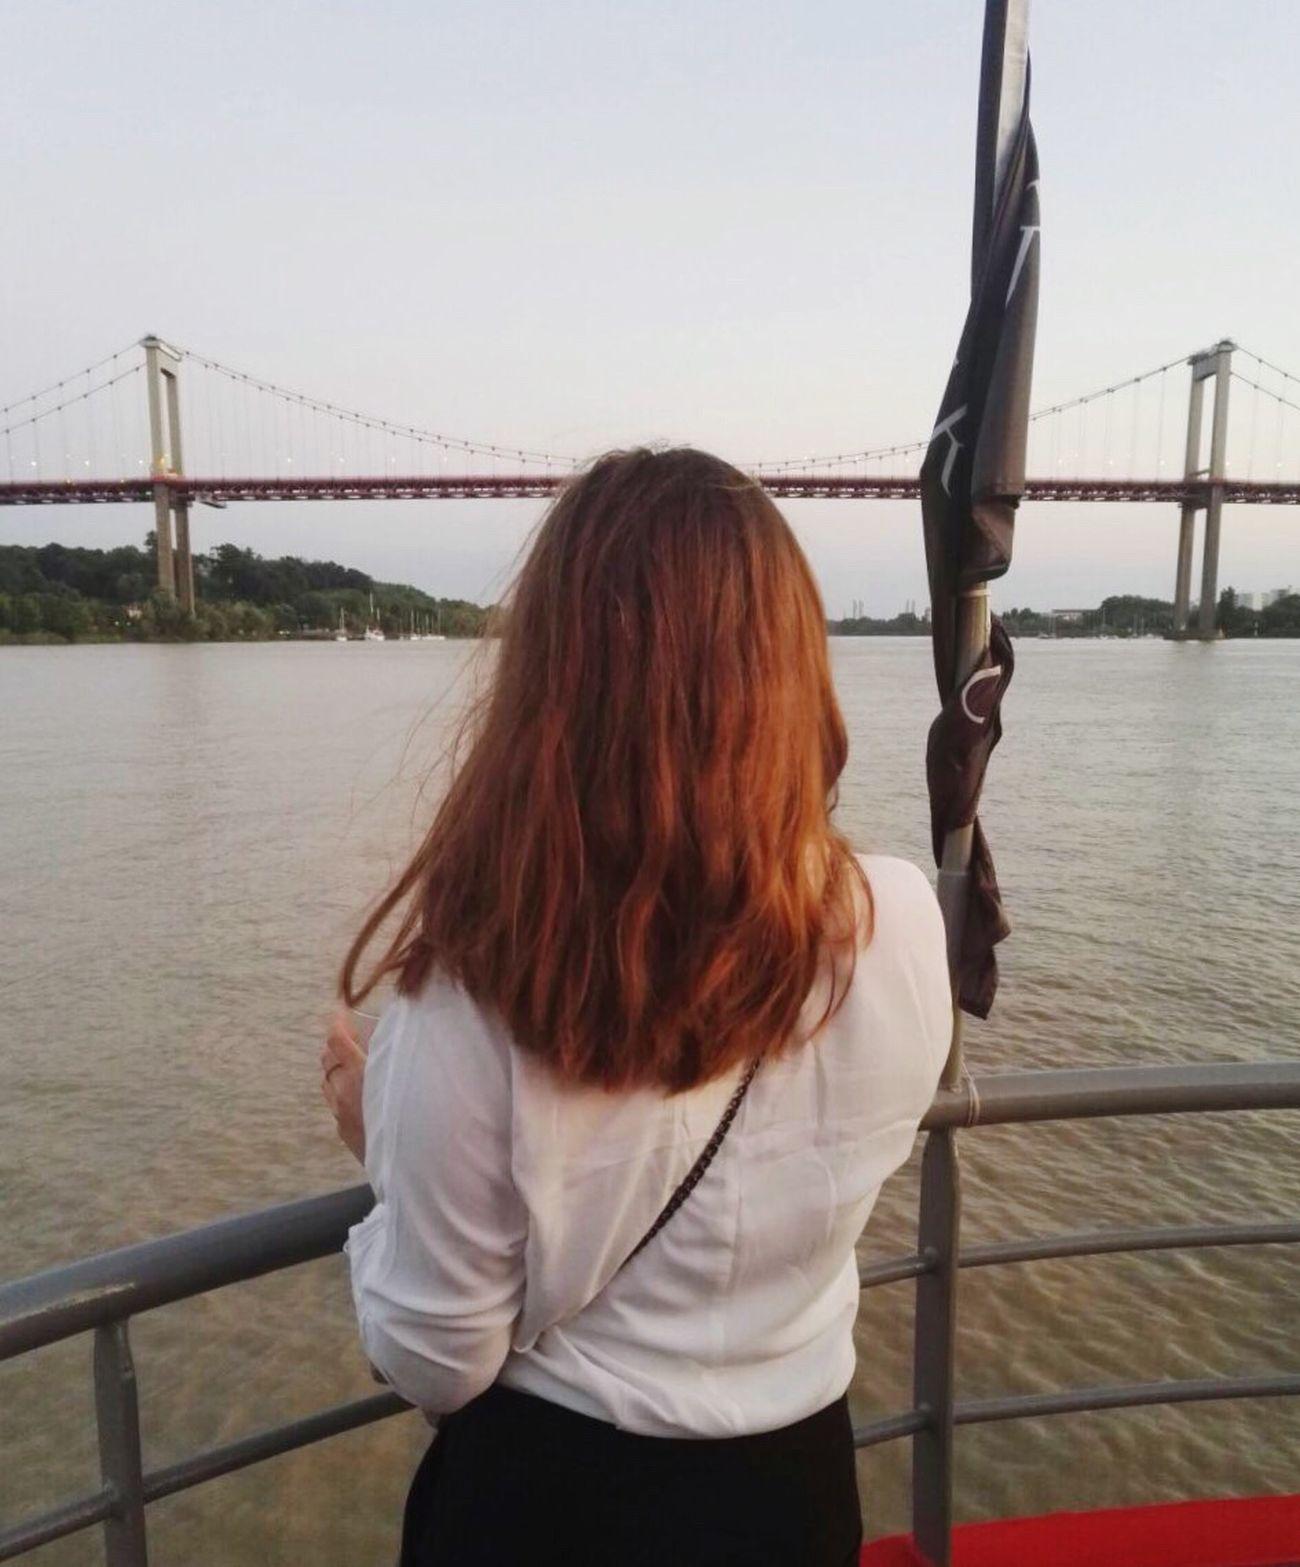 Girl Bordeaux Boat Diner Peaceful And Quiet Ginger Shorthair Garonne Lovemyjob